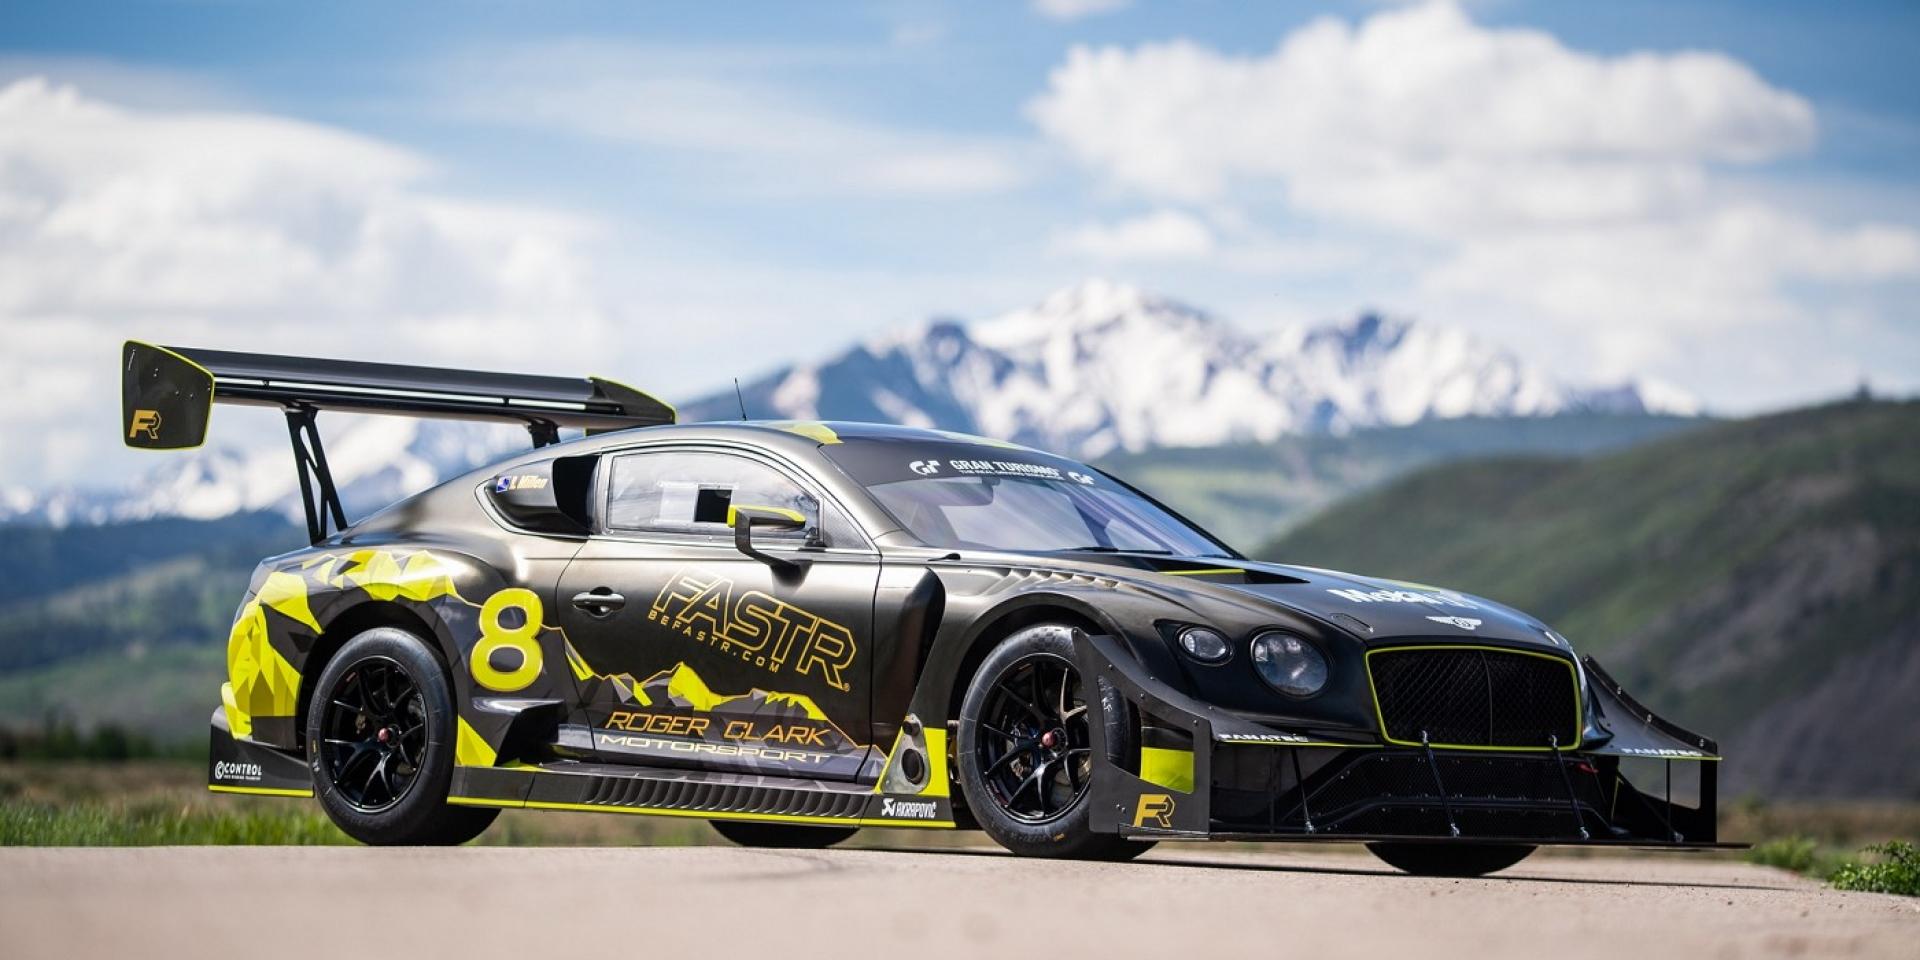 Bentley Continental GT3挑戰派克峰爬山賽,有望拿下品牌三冠王